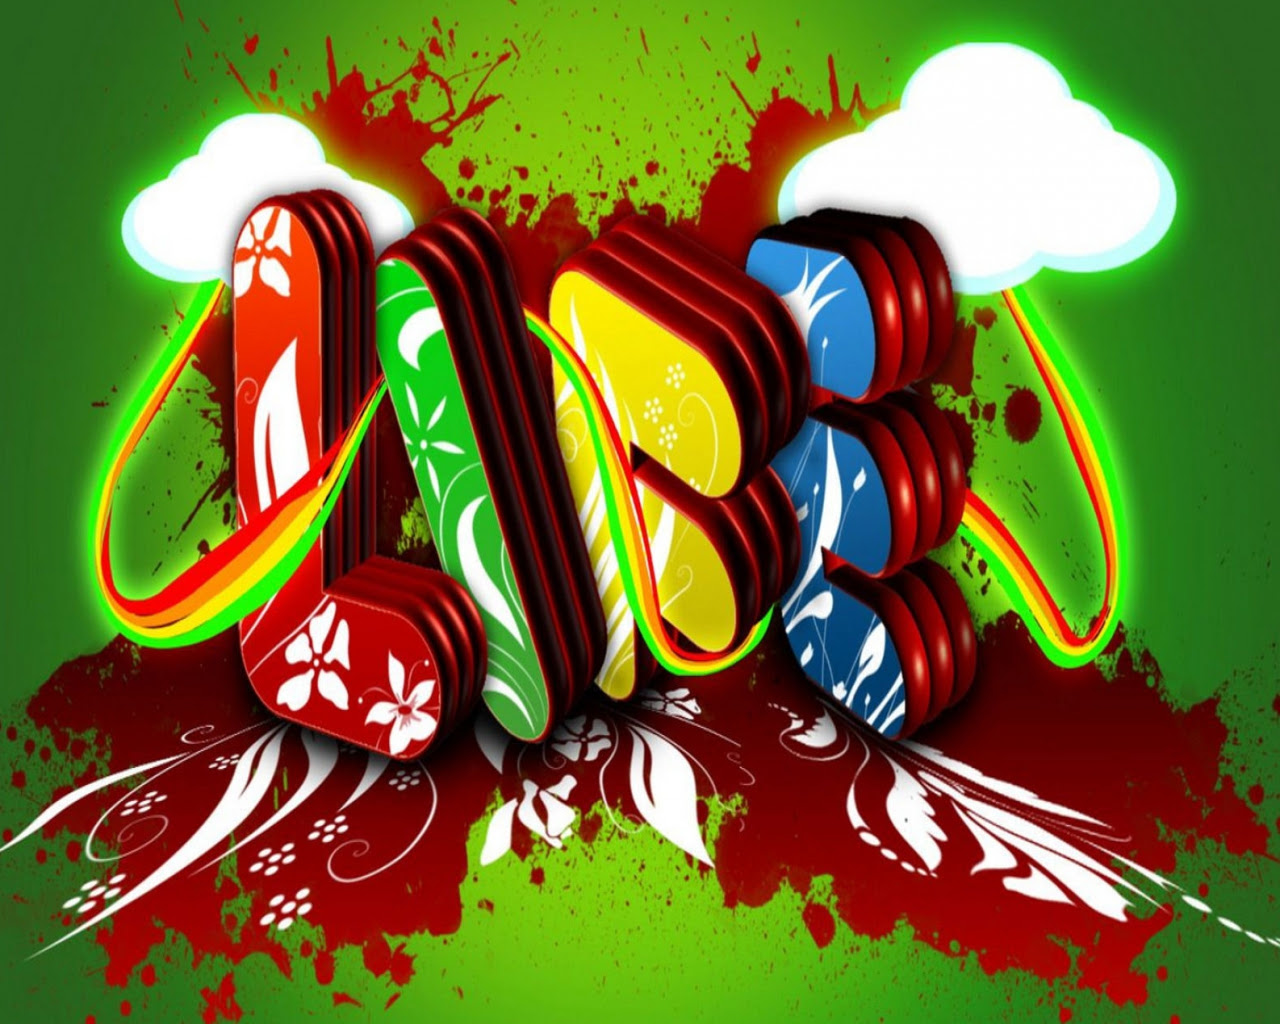 Unduh 8200 Wallpaper Animasi Grafiti Gambar HD Terbaru